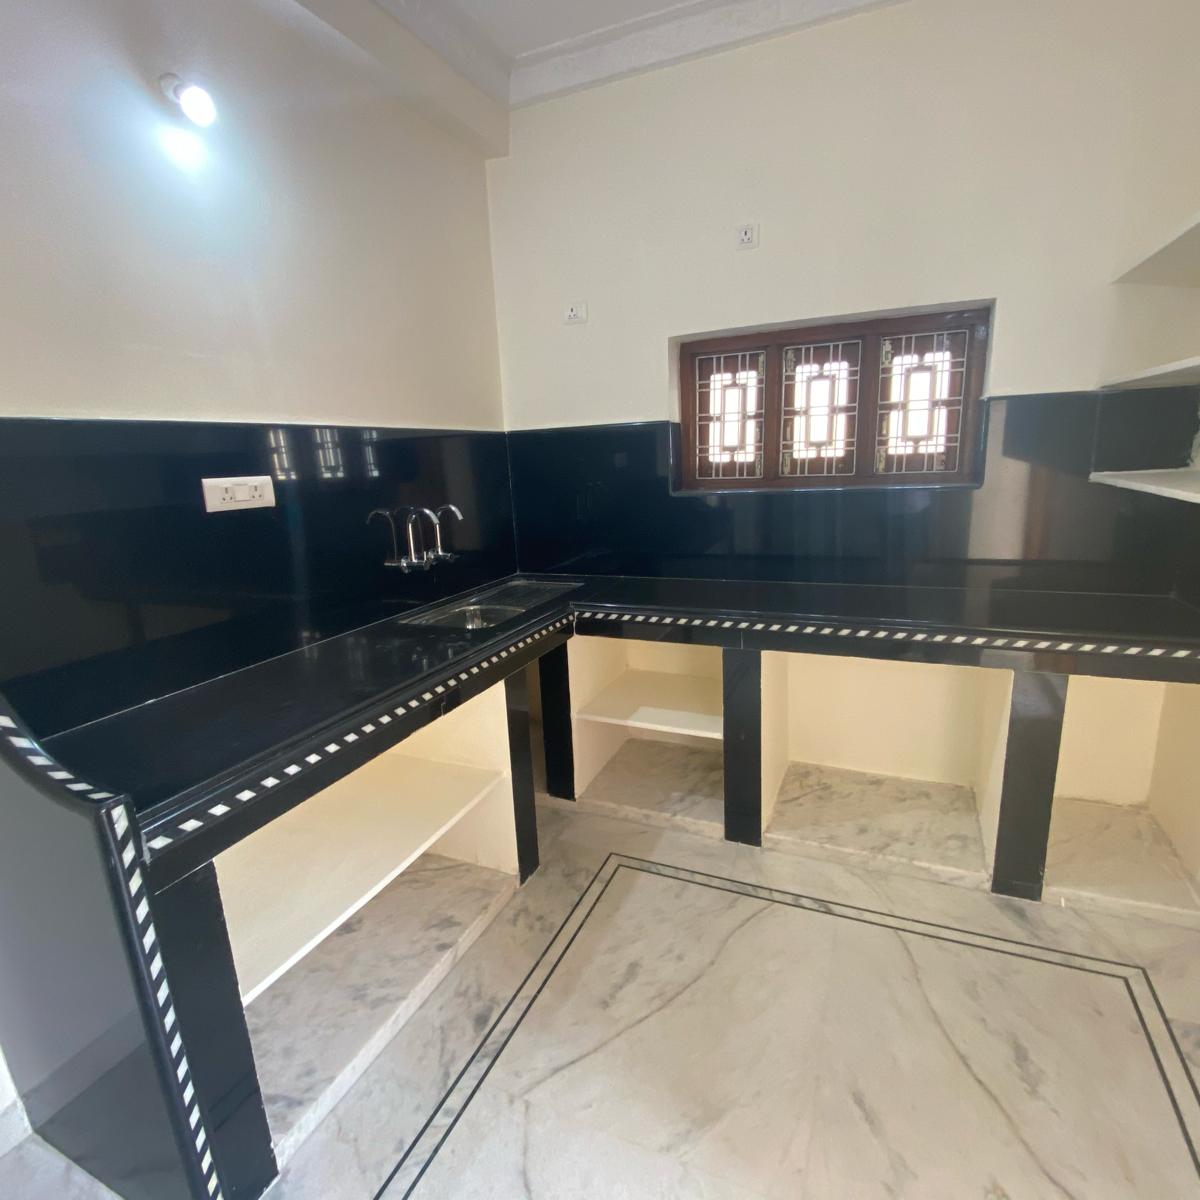 kitchen-Picture-karmanghat-2488275